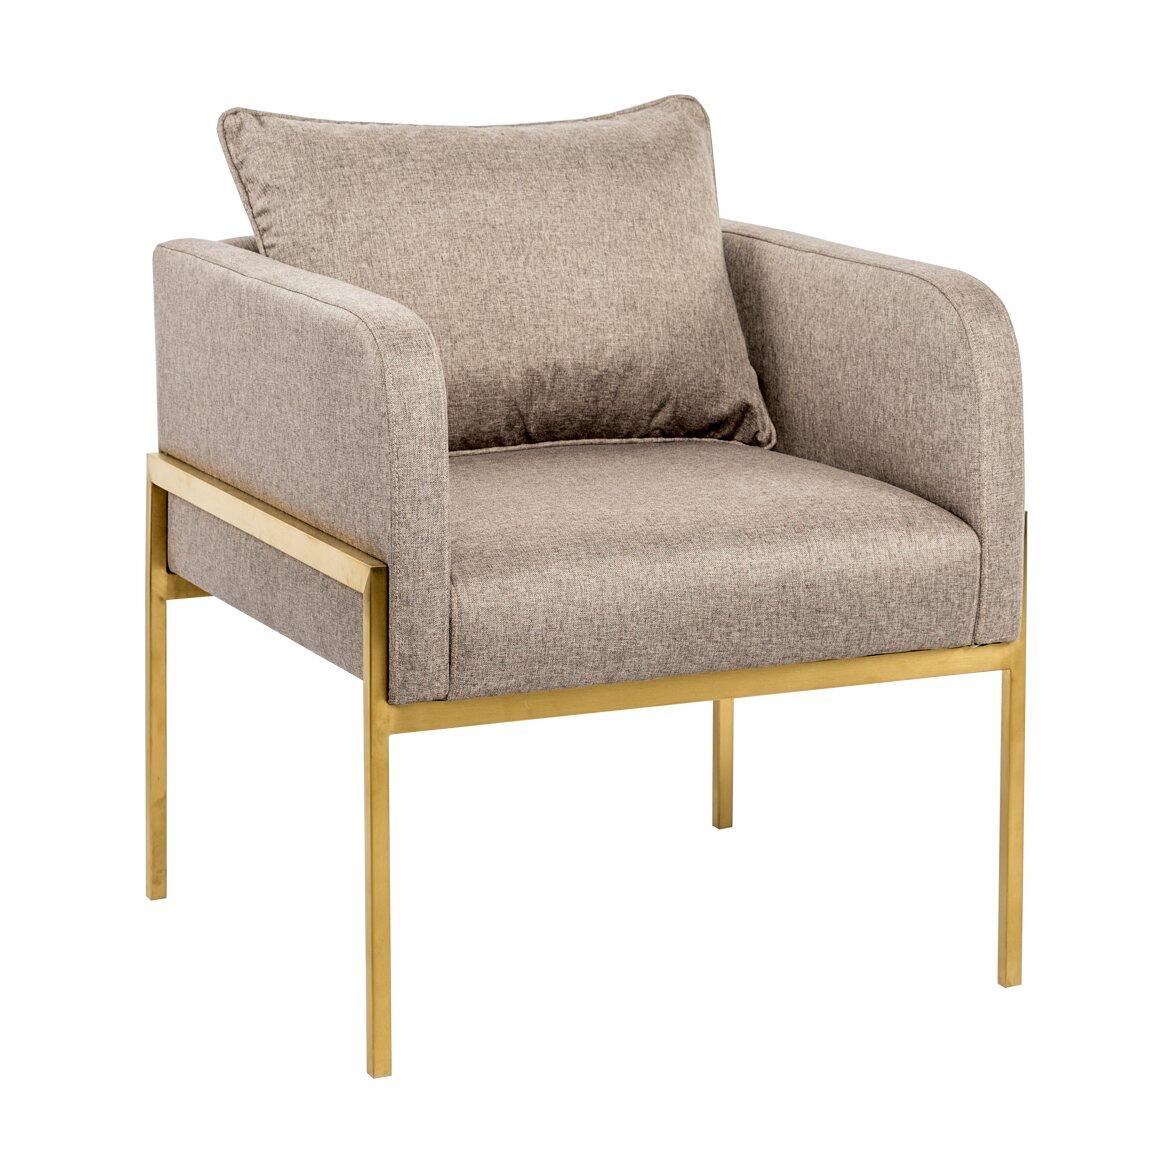 Кресло «Легато / Грэй» 2 | Кресло-стул Kingsby